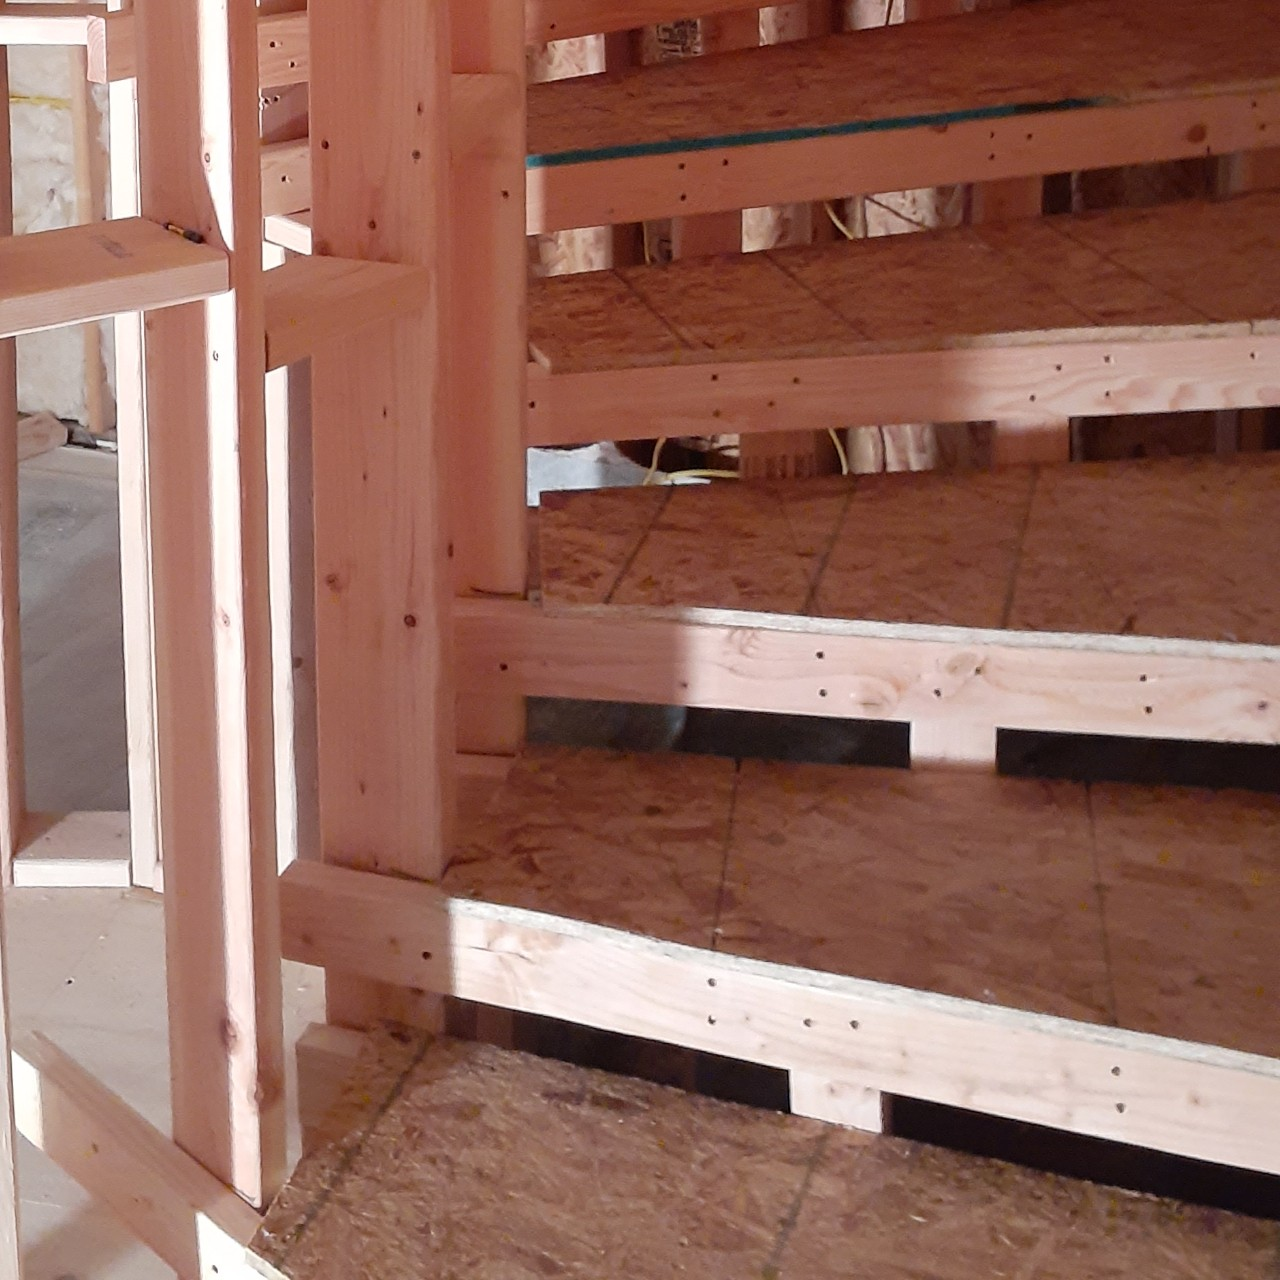 carpentry-wood-framing-second-floor-home-addition--framing-22